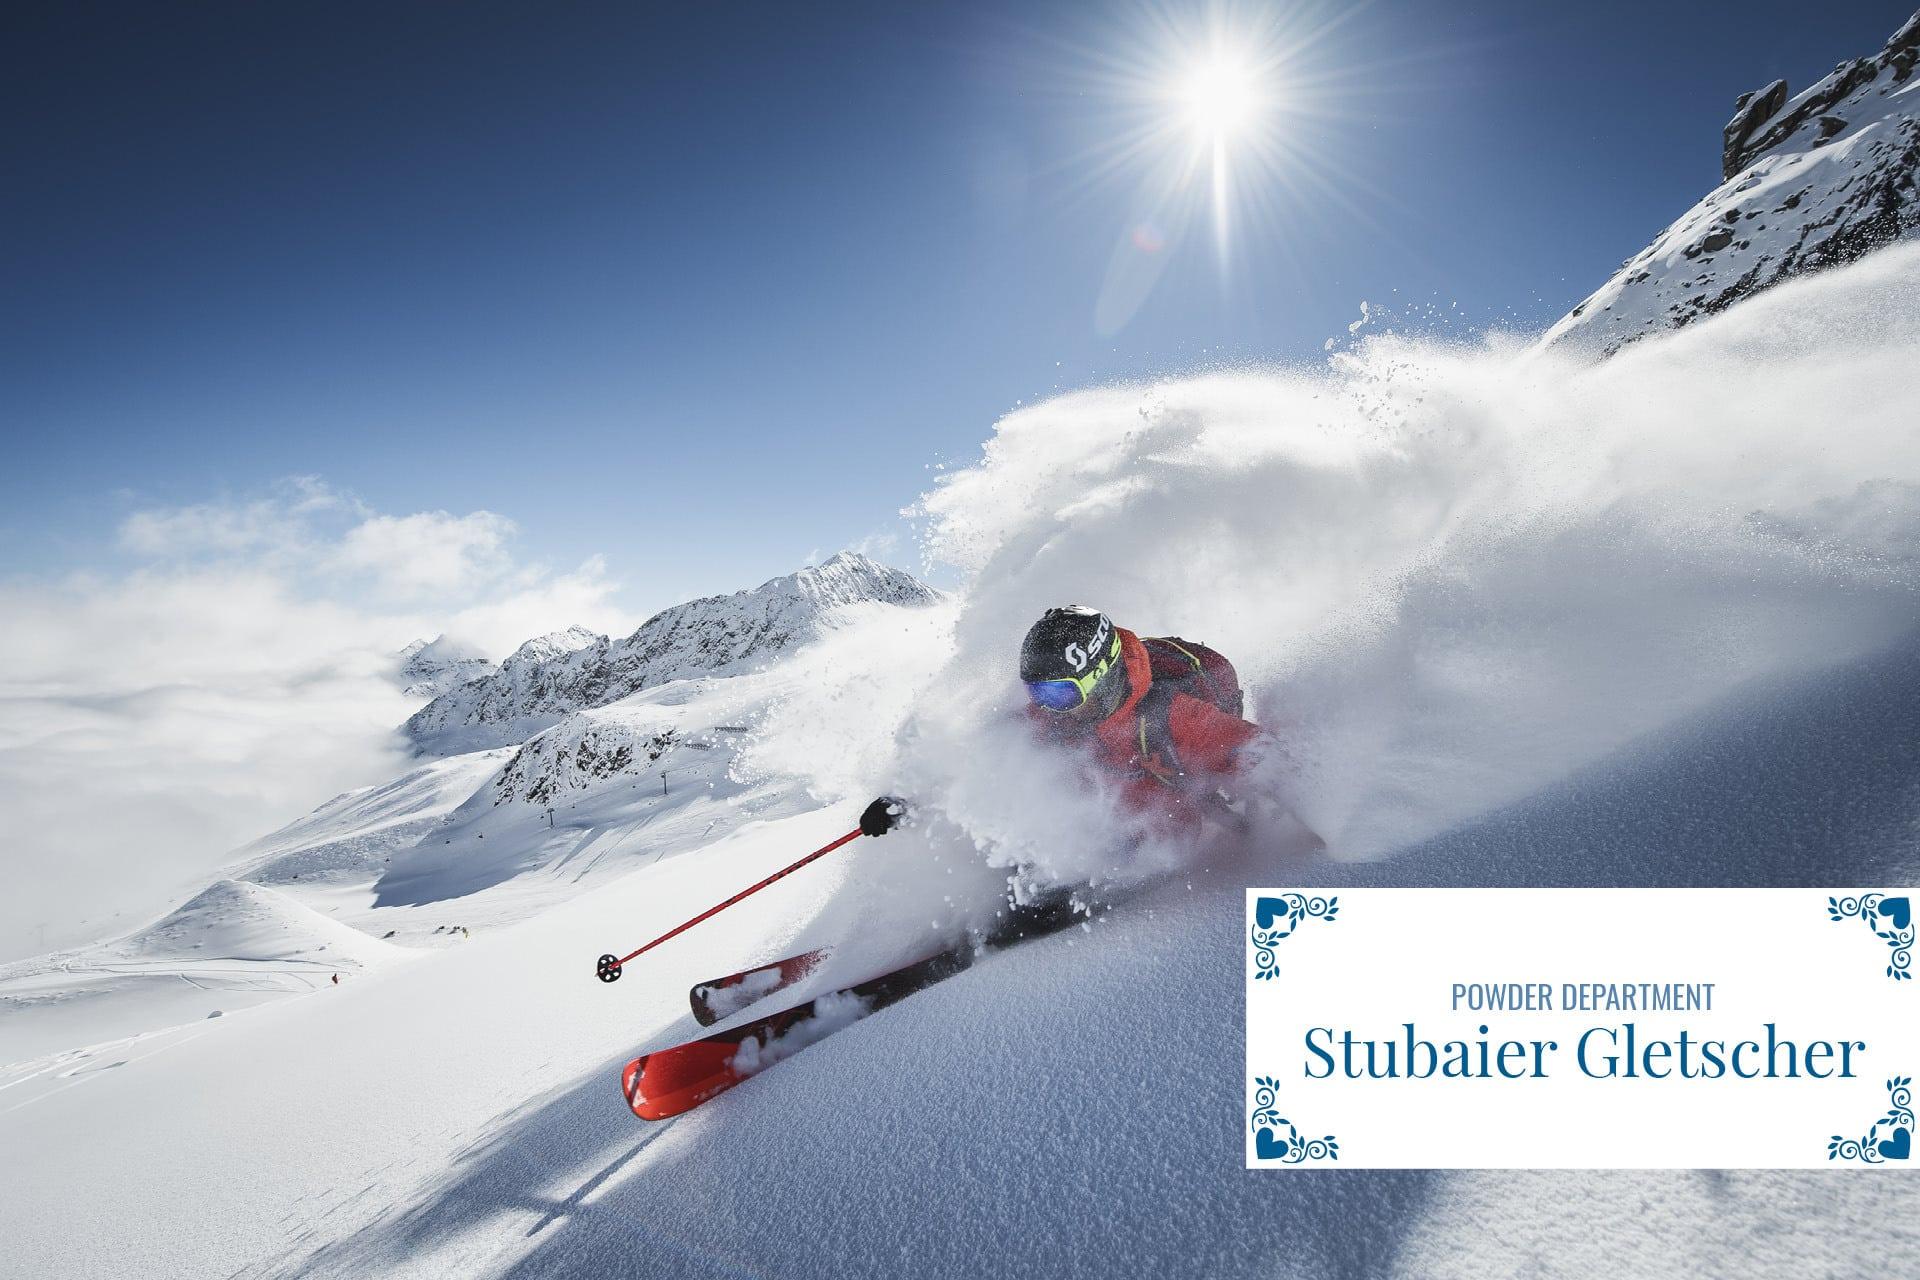 Sepp-und-Hannis-Stubaital-Winterhighlight-Powder-Department-Aktivurlaub-Tirol